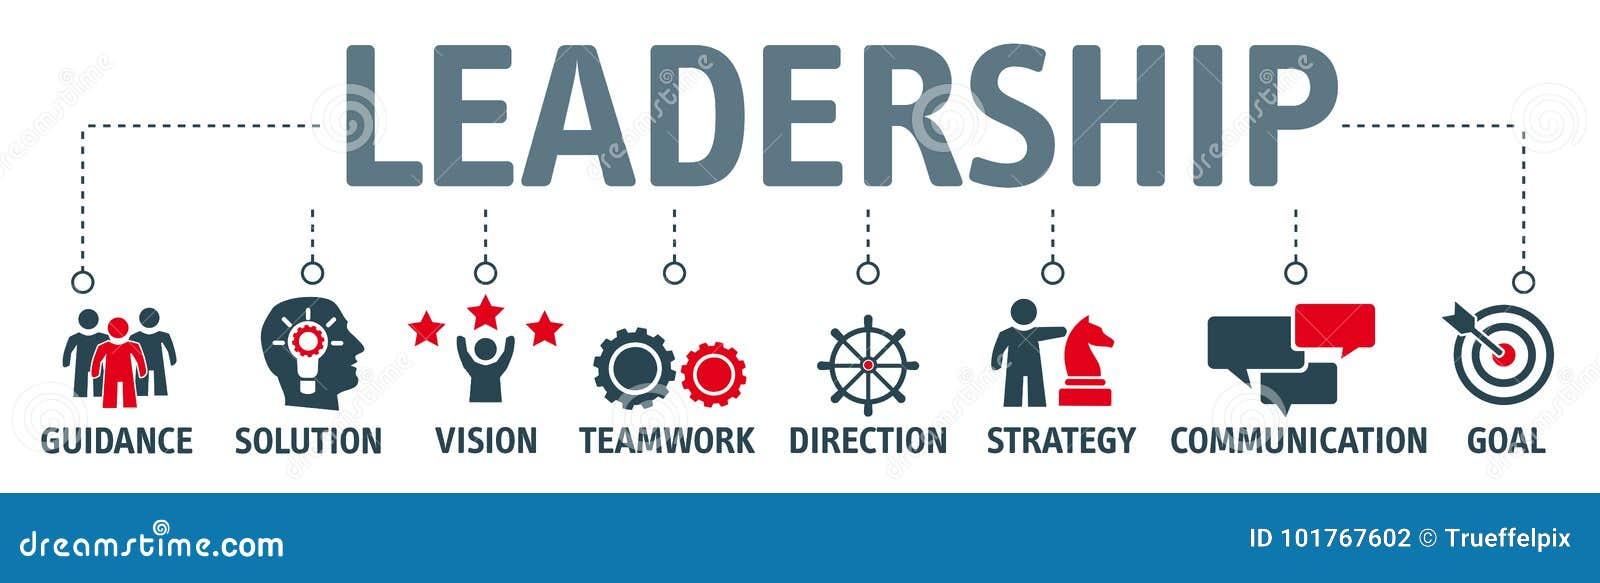 Banner Leadership Concept Stock Illustration Illustration Of Instructor 101767602